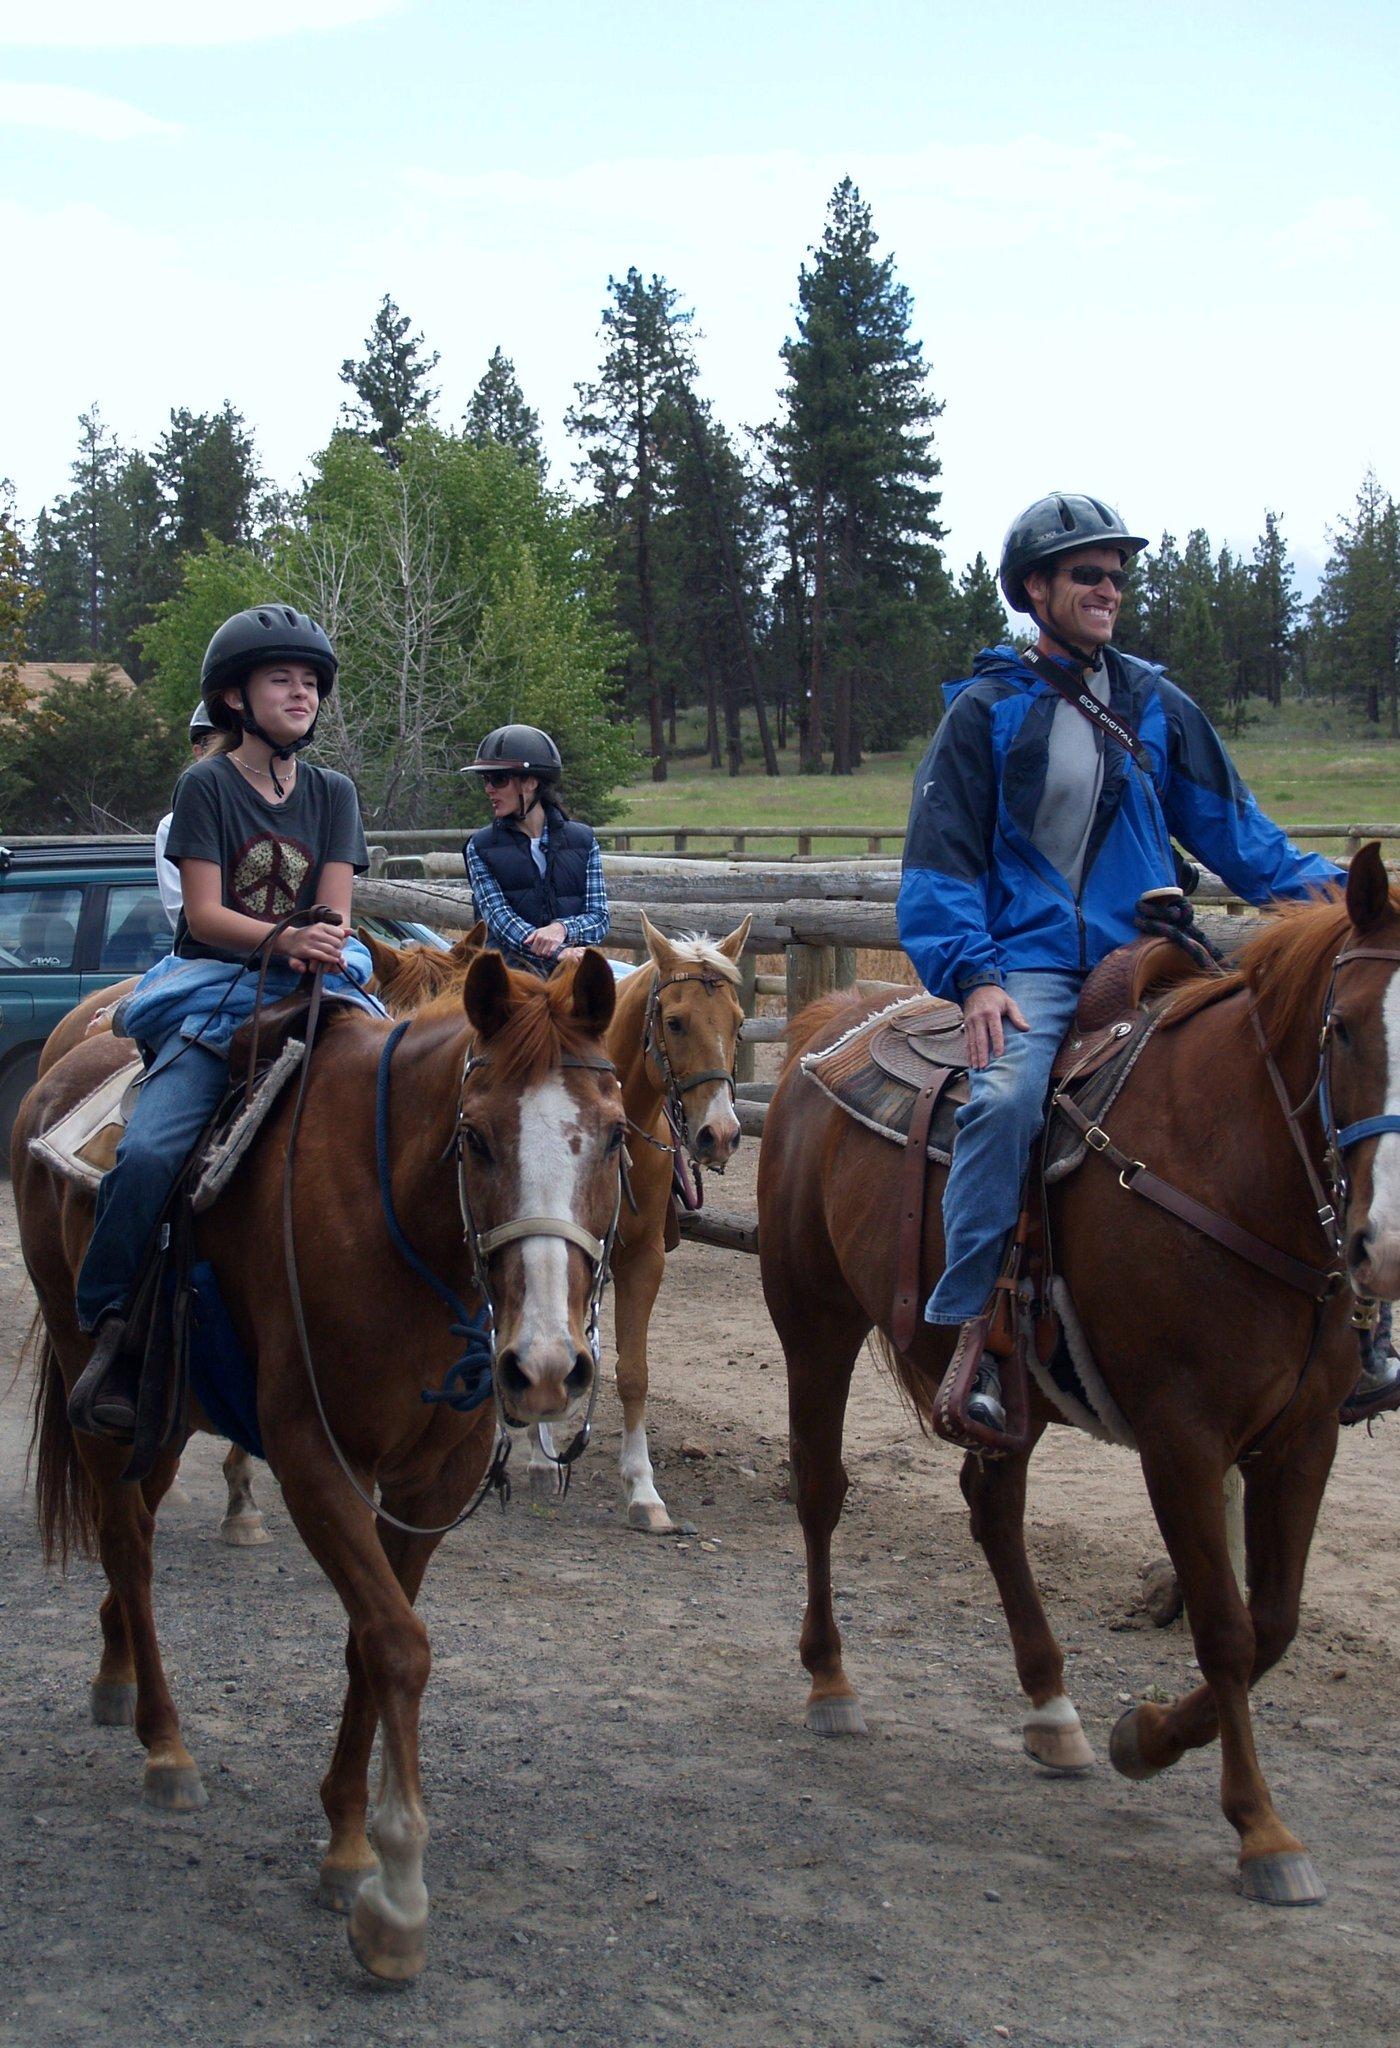 trail-ride-group-1.jpg